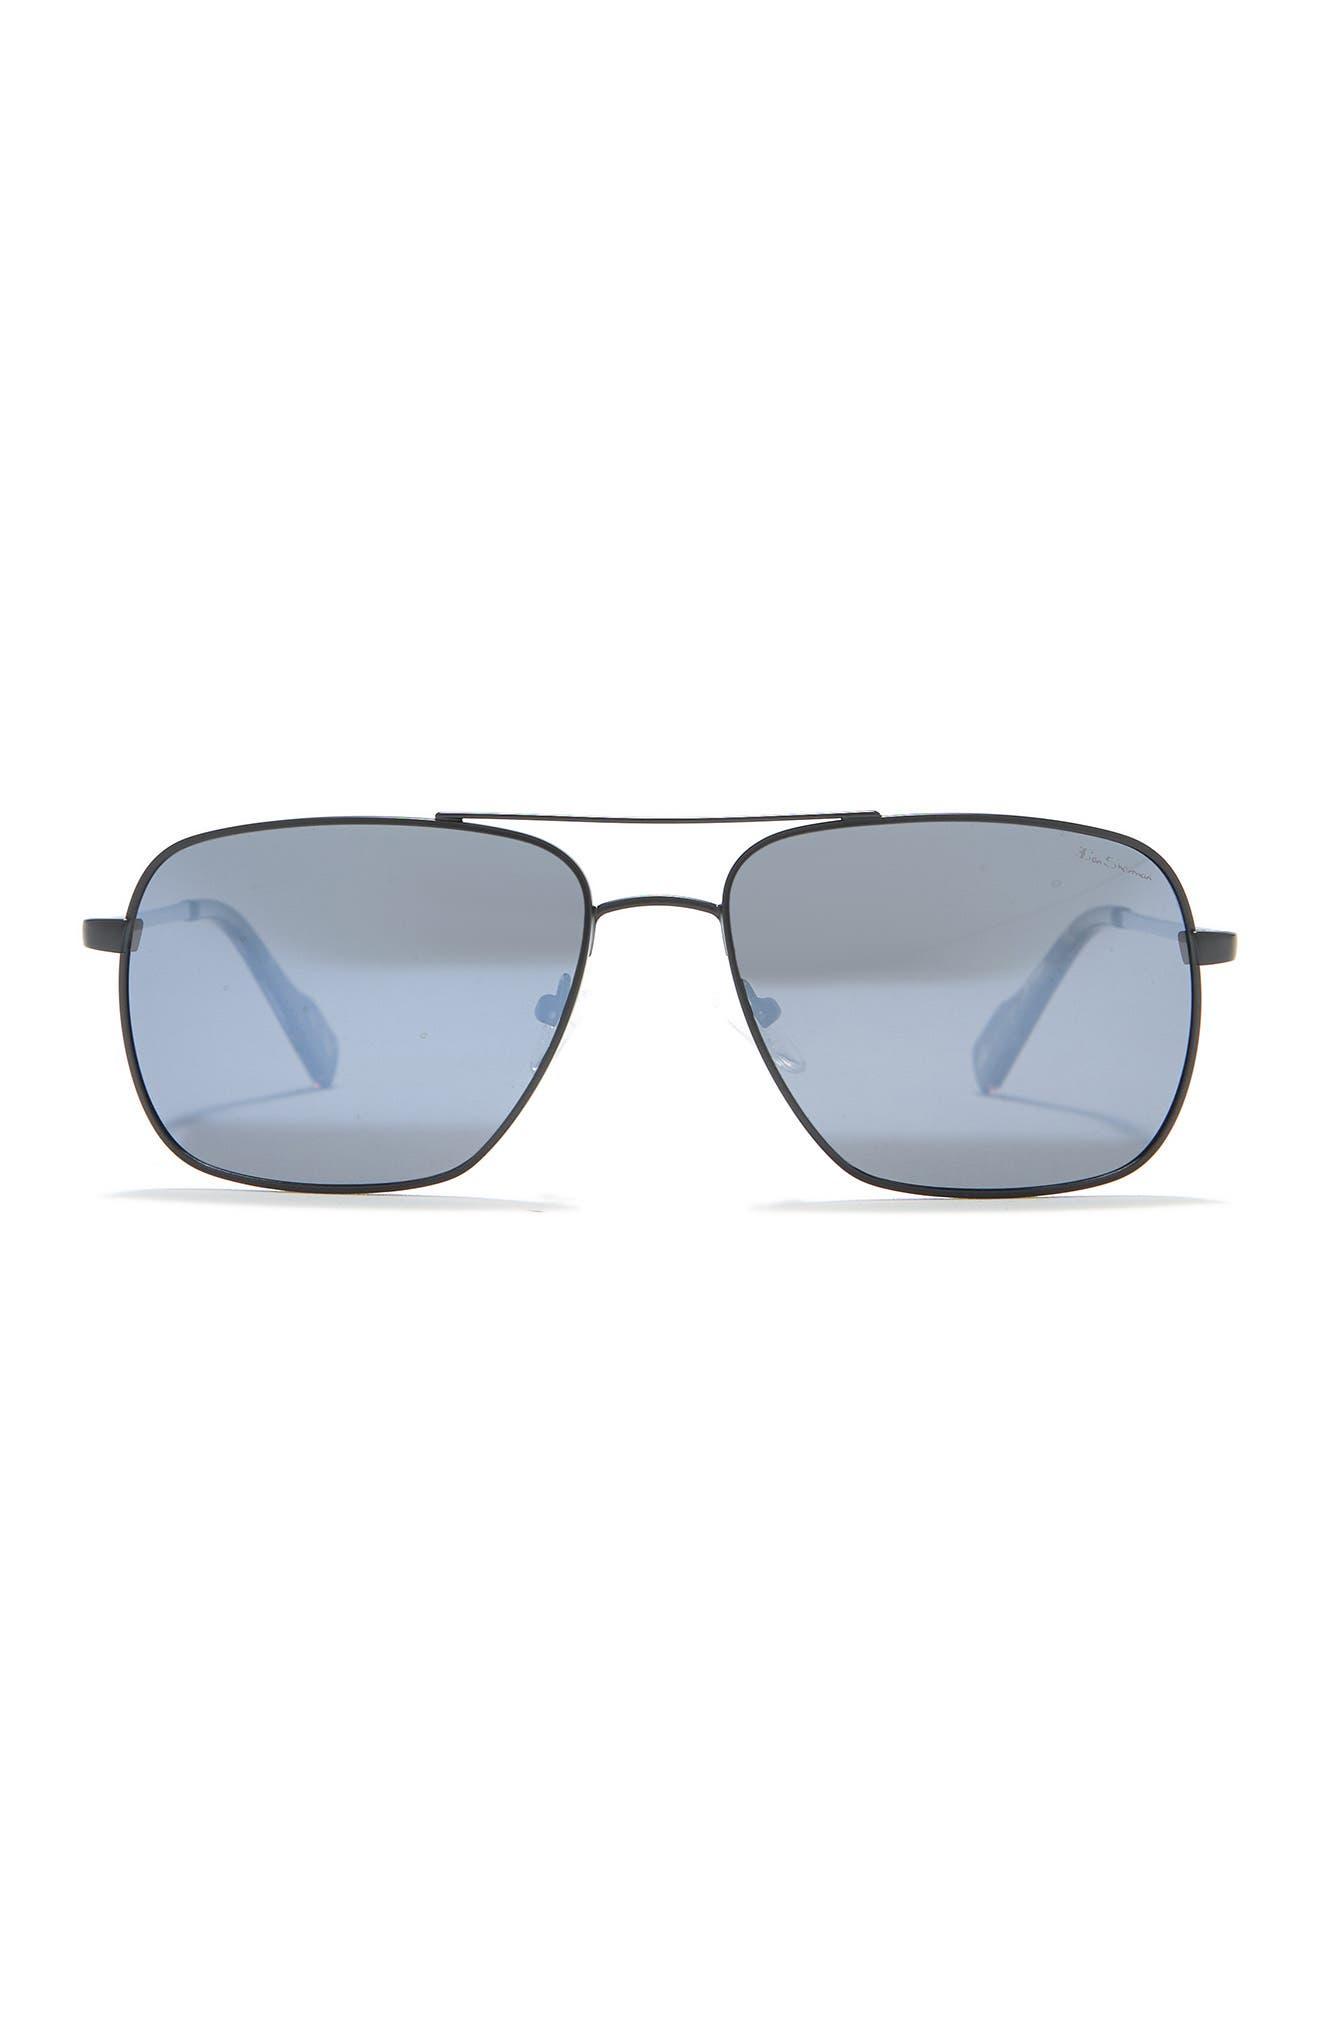 Image of Ben Sherman Stephen 58mm Aviator Sunglasses